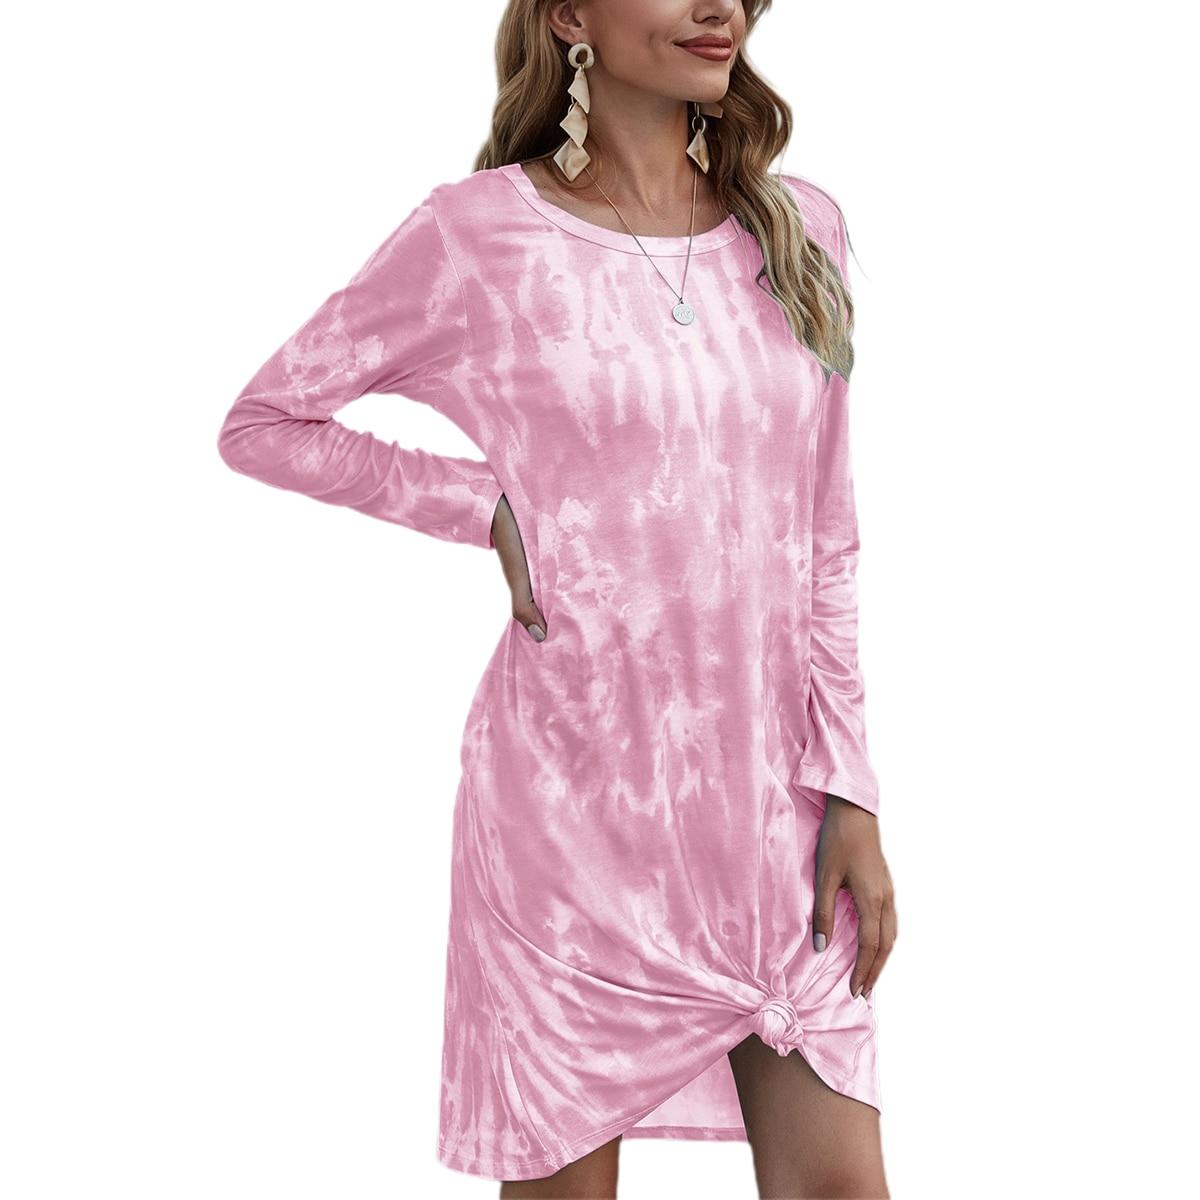 Women Dress Womens Tie-Dye Printing Dresses Round Neck Long Sleeve Dress Streetwear Womens Dresses Vestidos Mujer 2020 Clothes